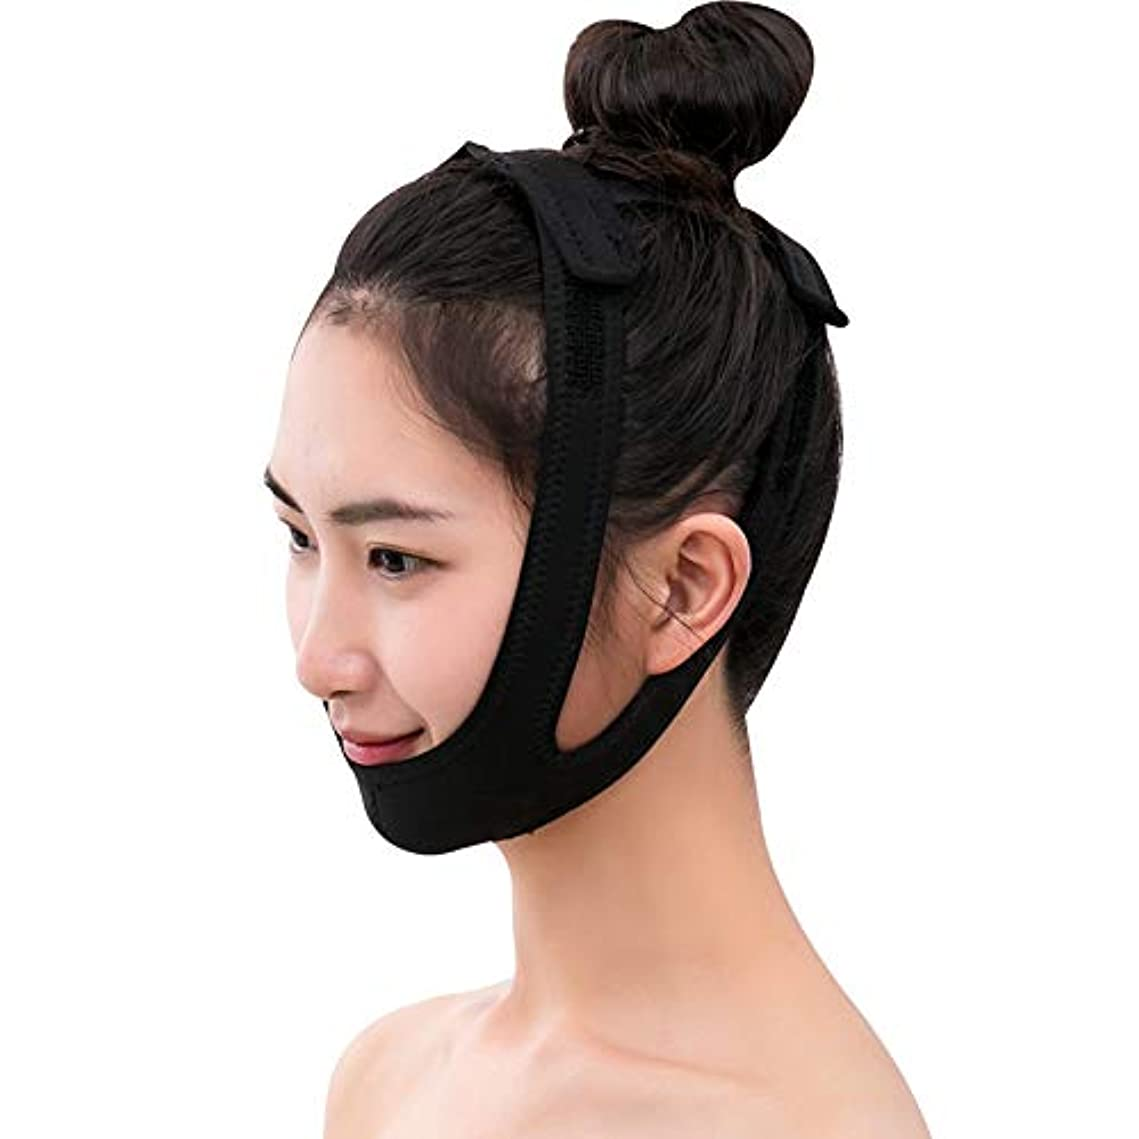 Rui Peng フェイスリフティングベルト シンフェイスバンド - シンフェイスバンデージ美容機器フェイシャルリフト睡眠マスク法Vフェイスマスクを通気性にする